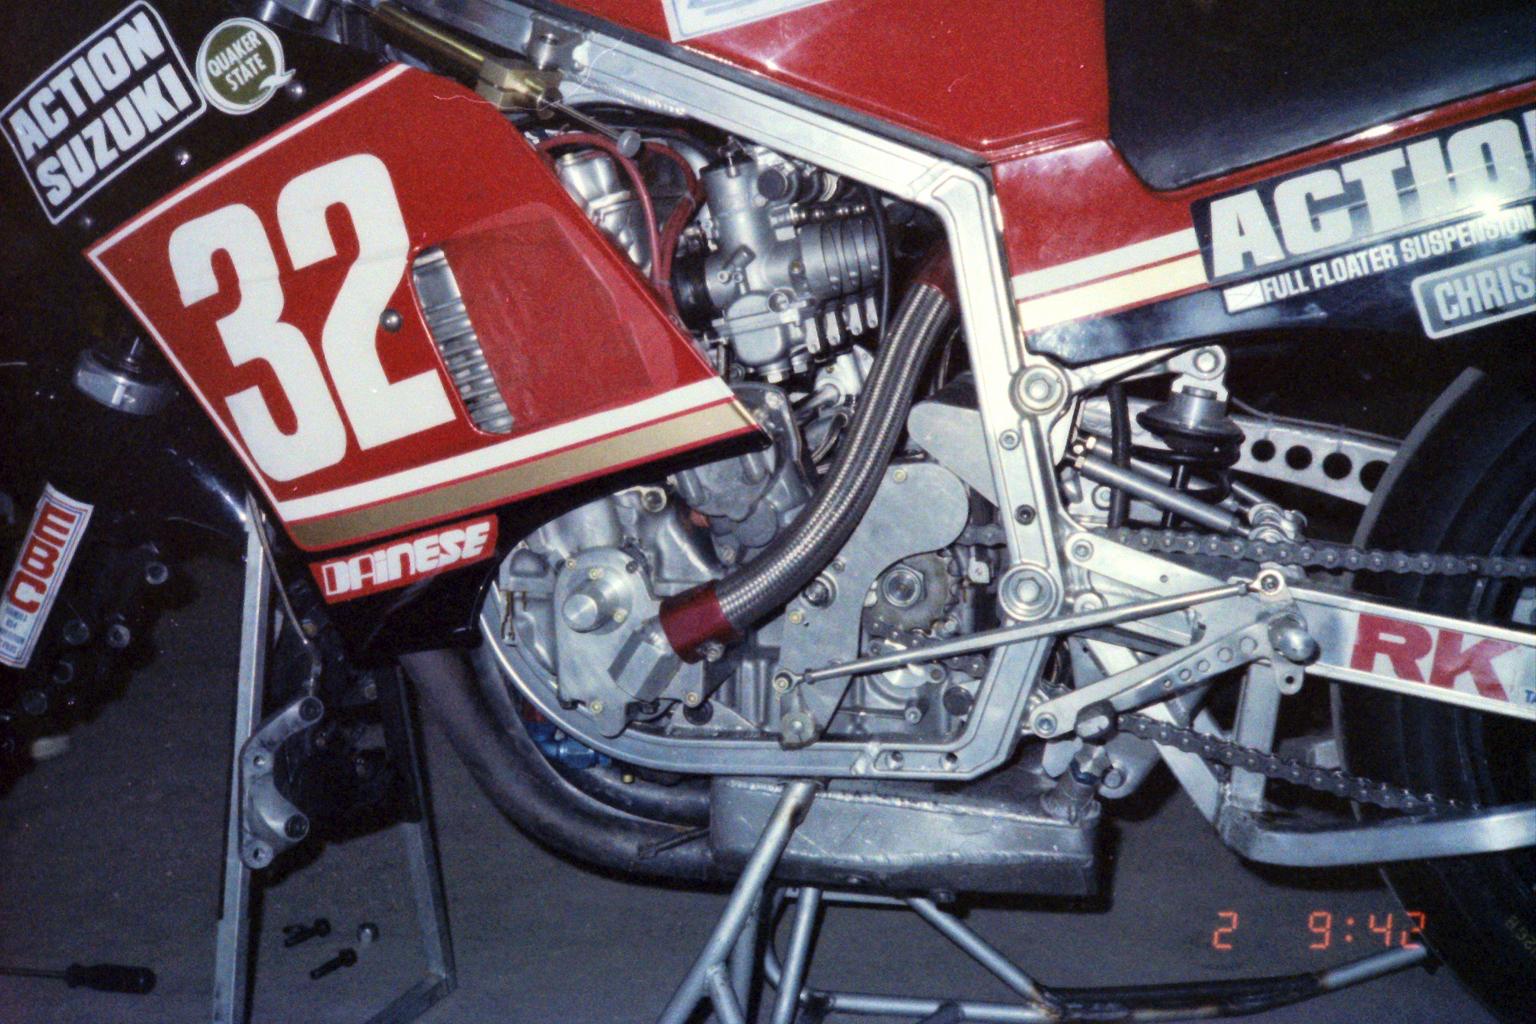 1984_Australia-12-2_ロブ・フィリスのマシン